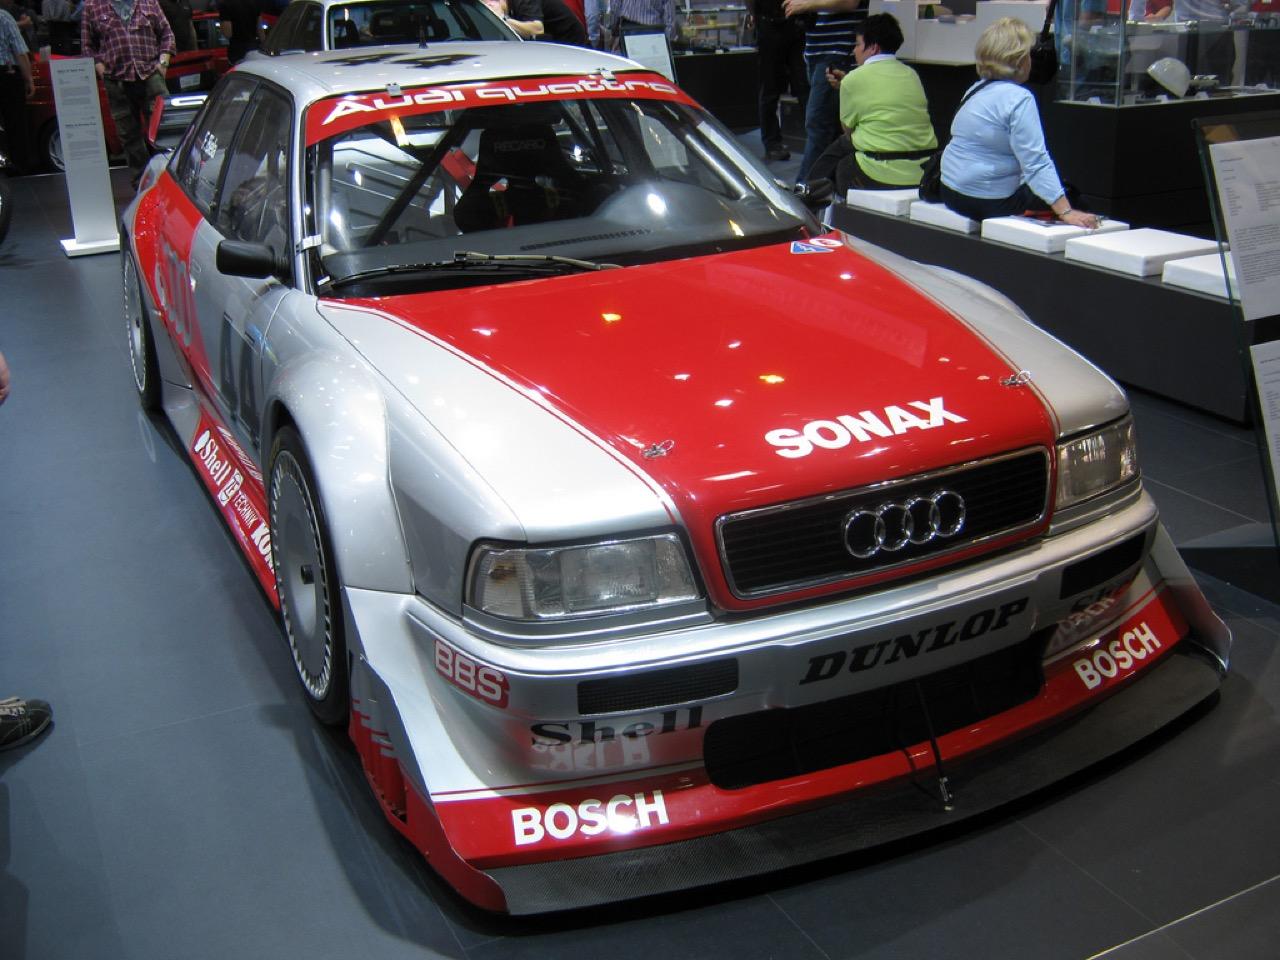 Audi 80 V6 DTM... V6 ? DTM ? C'est quoi c'bordel ?! 35